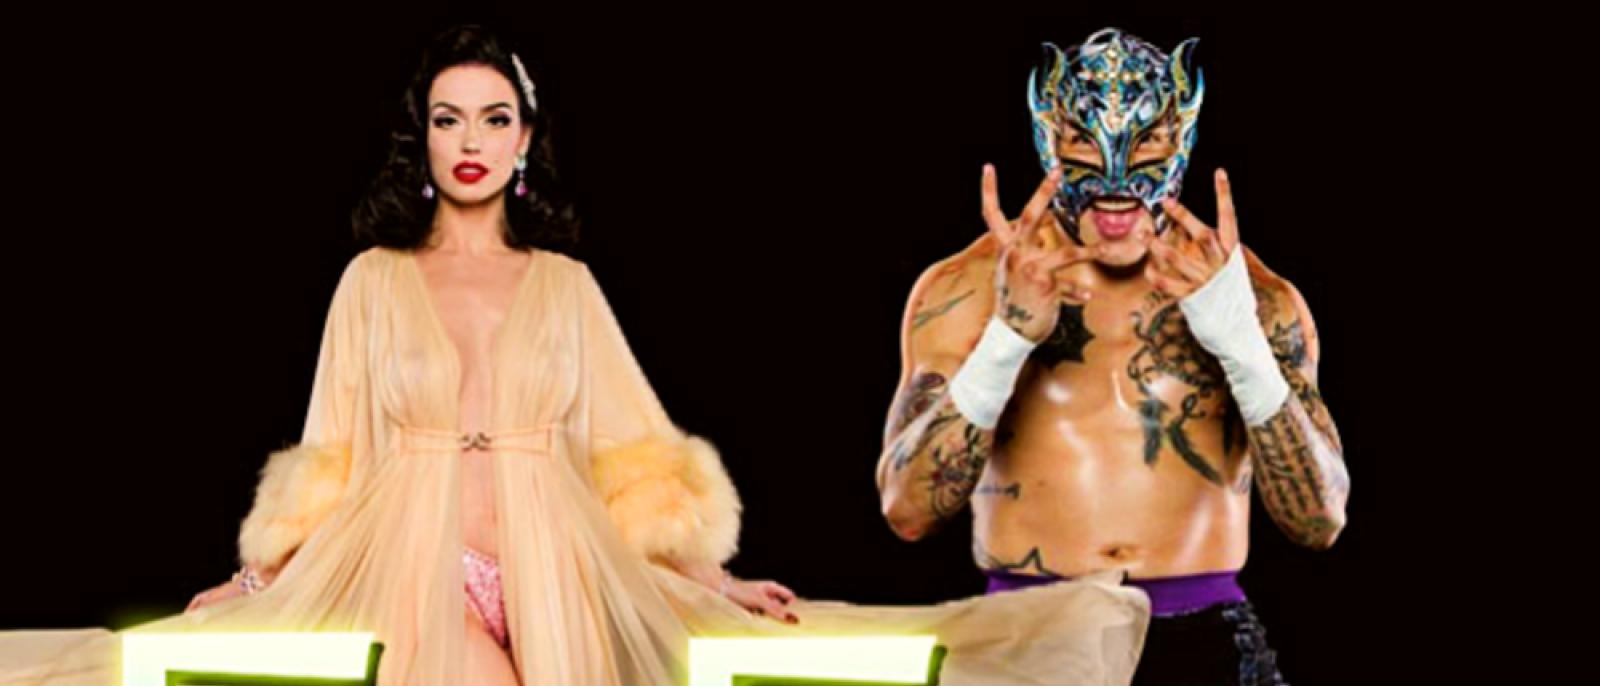 Lucha VaVOOM: Fiesta Fantasma at The Mayan